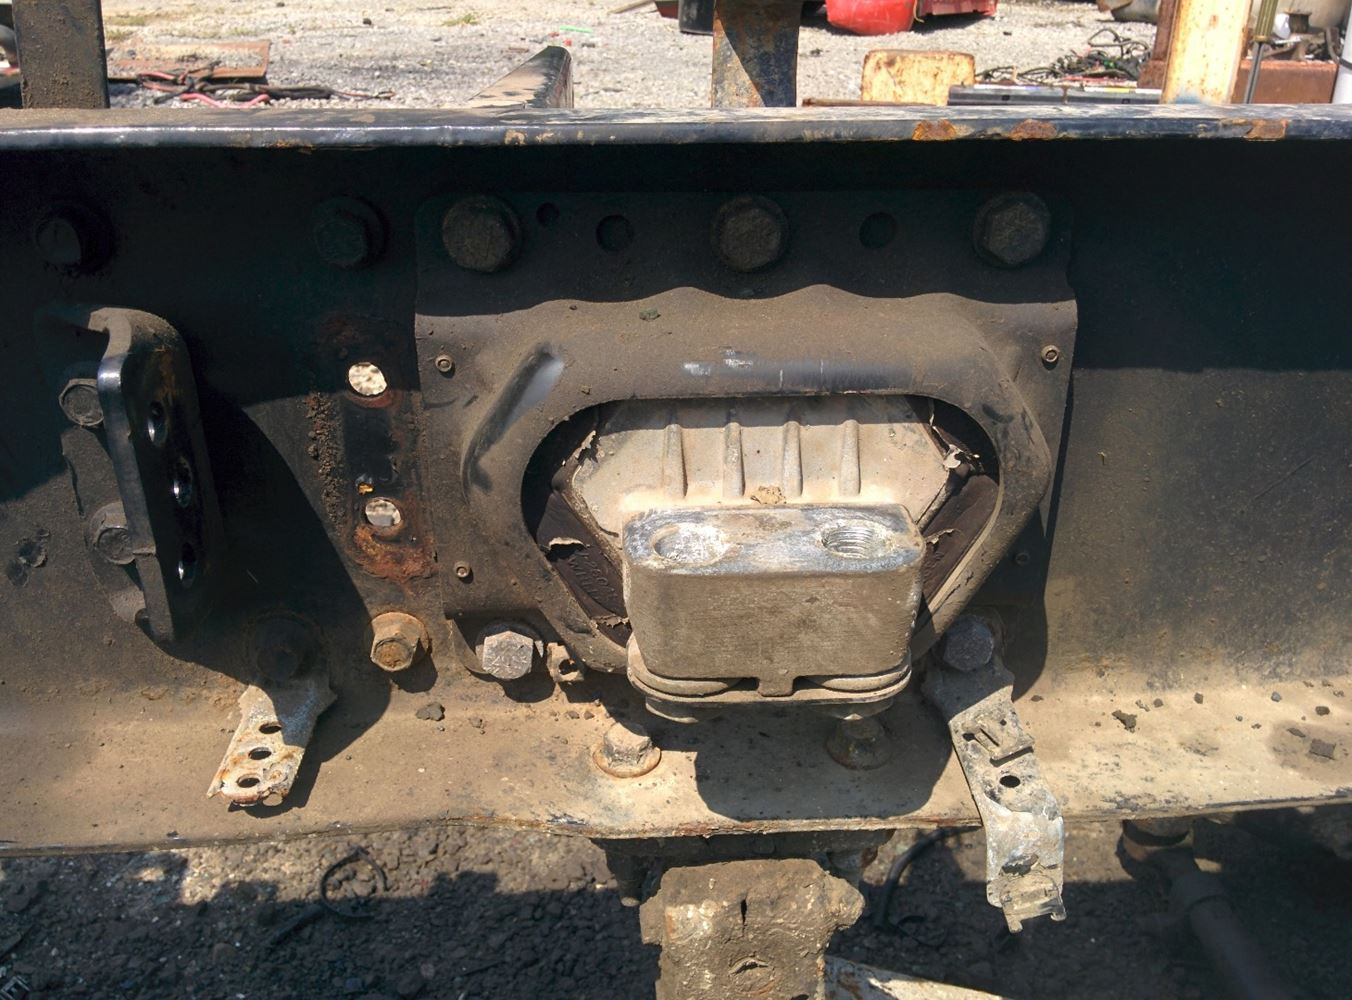 Ontario Truck Parts >> 2008 Mack CXU613 (Stock #MK-0423-63) | Engine Mounts 2 | TPI